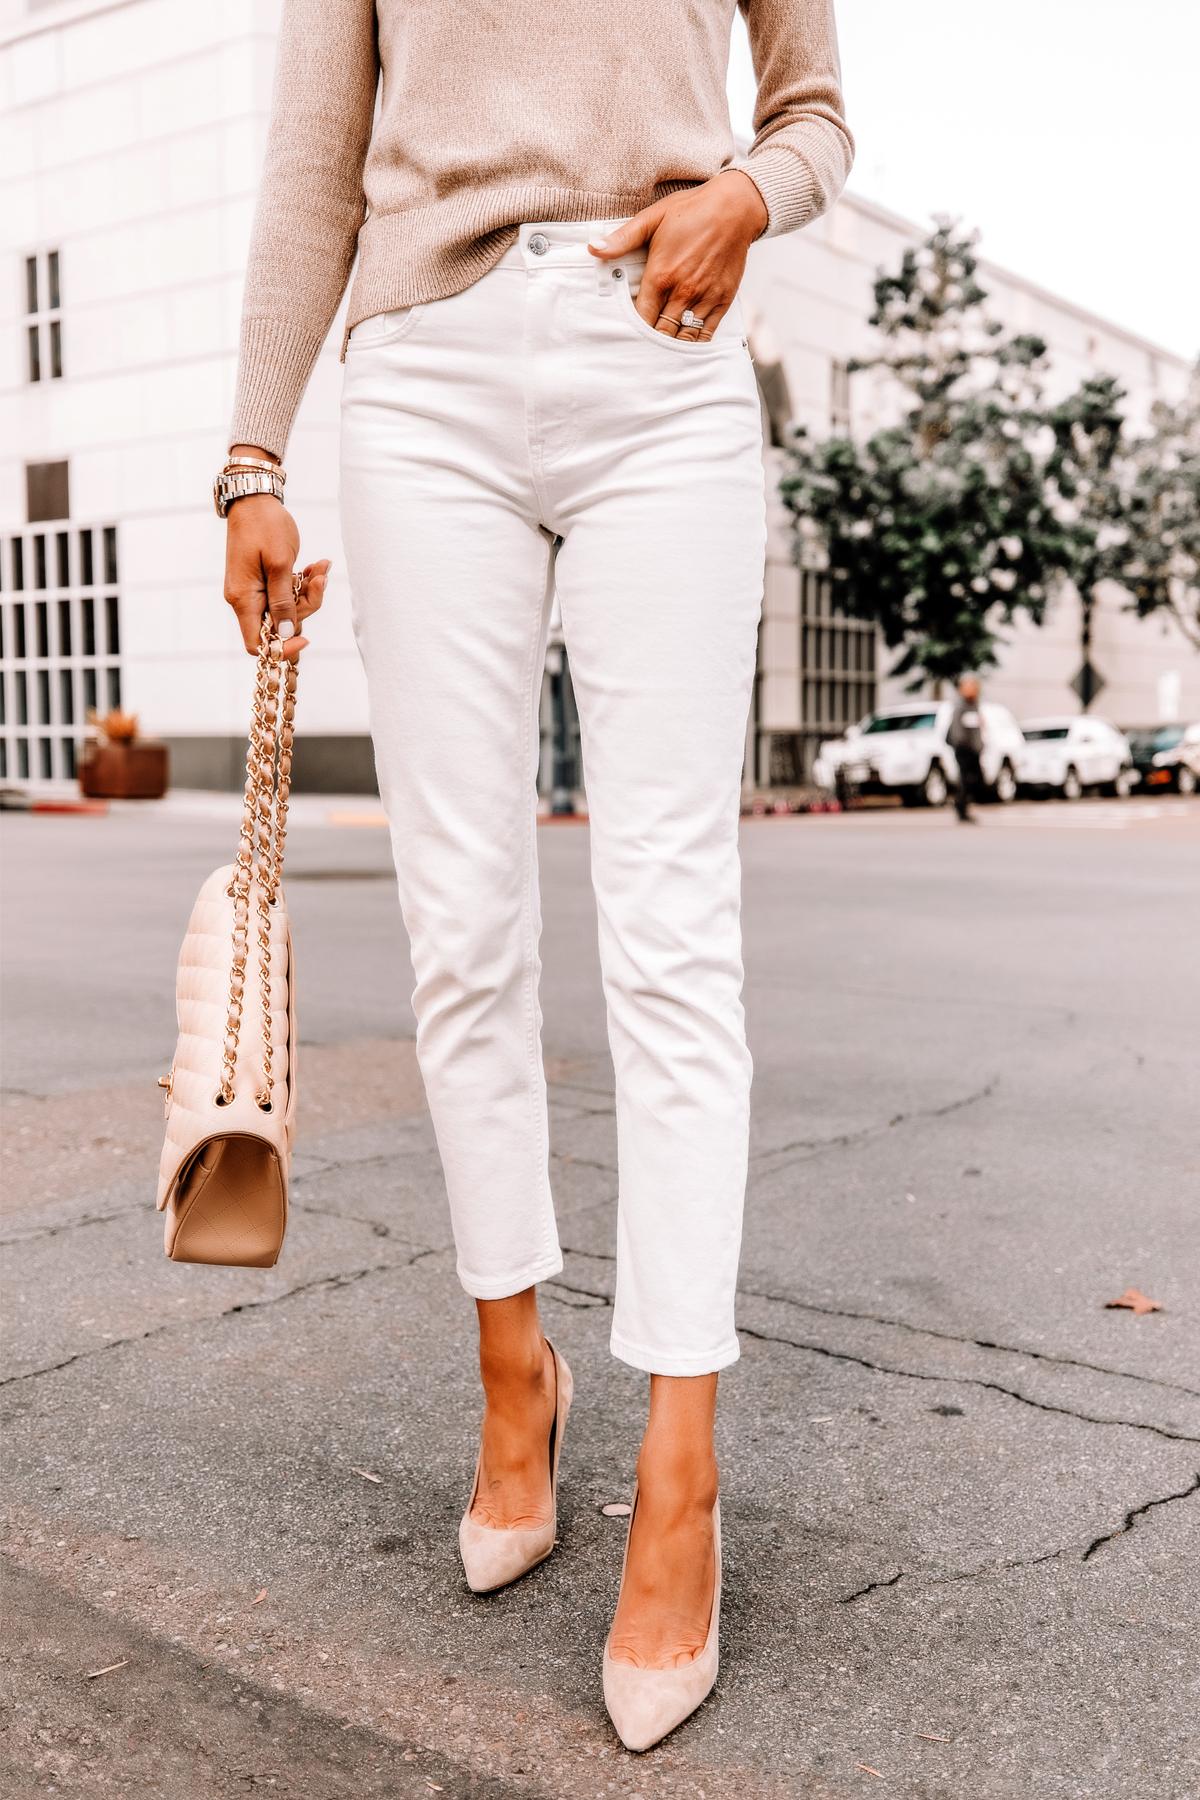 Fashion Jackson Wearing Everlane Beige Sweater Everlane White Cheeky Straight Leg Jeans Nude Heels